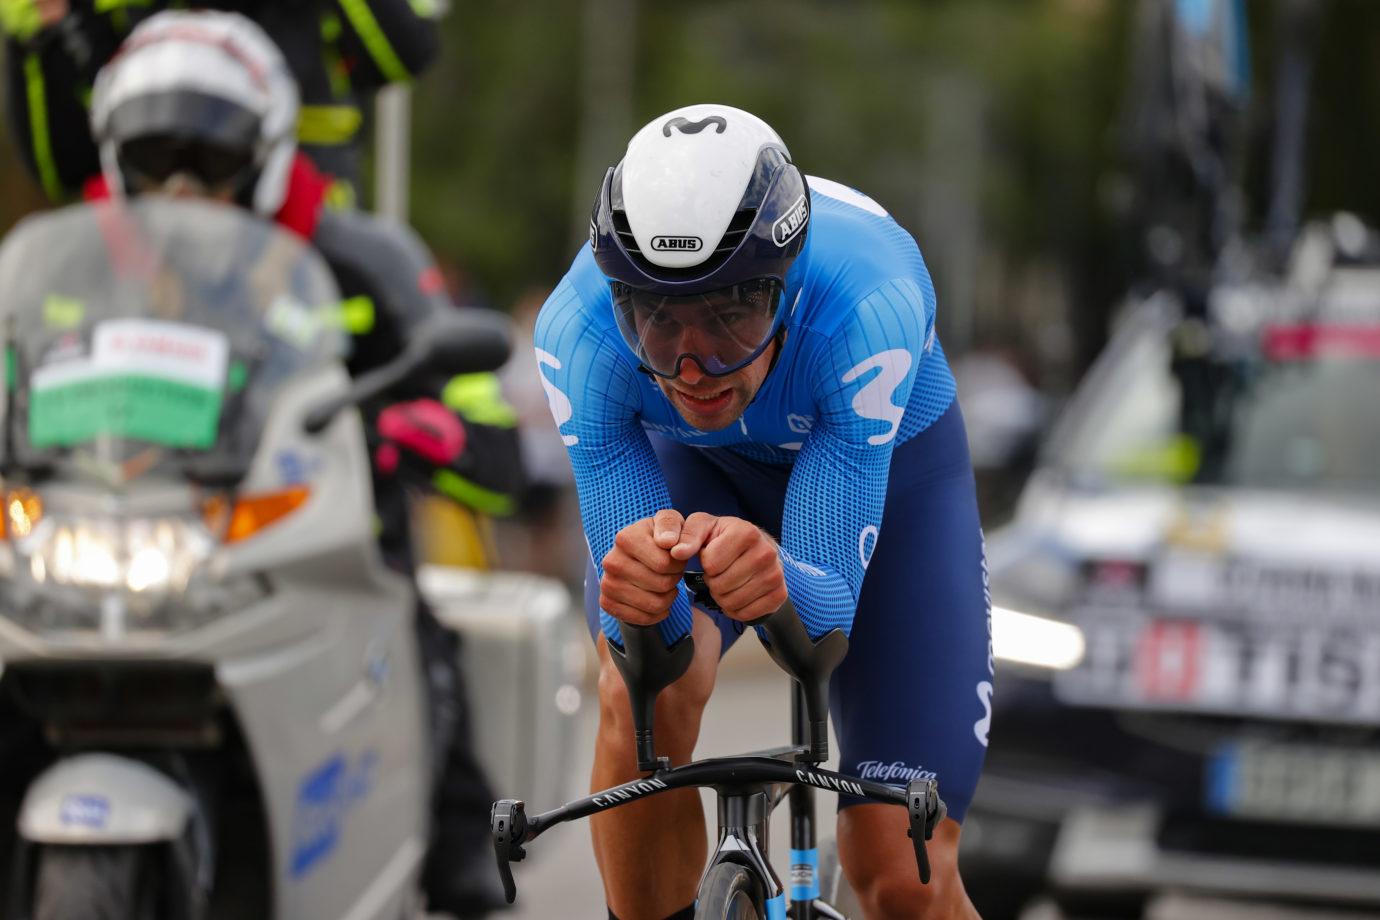 Imagen de la noticia 'Oliveira top Blue performer at Giro's inaugural TT'